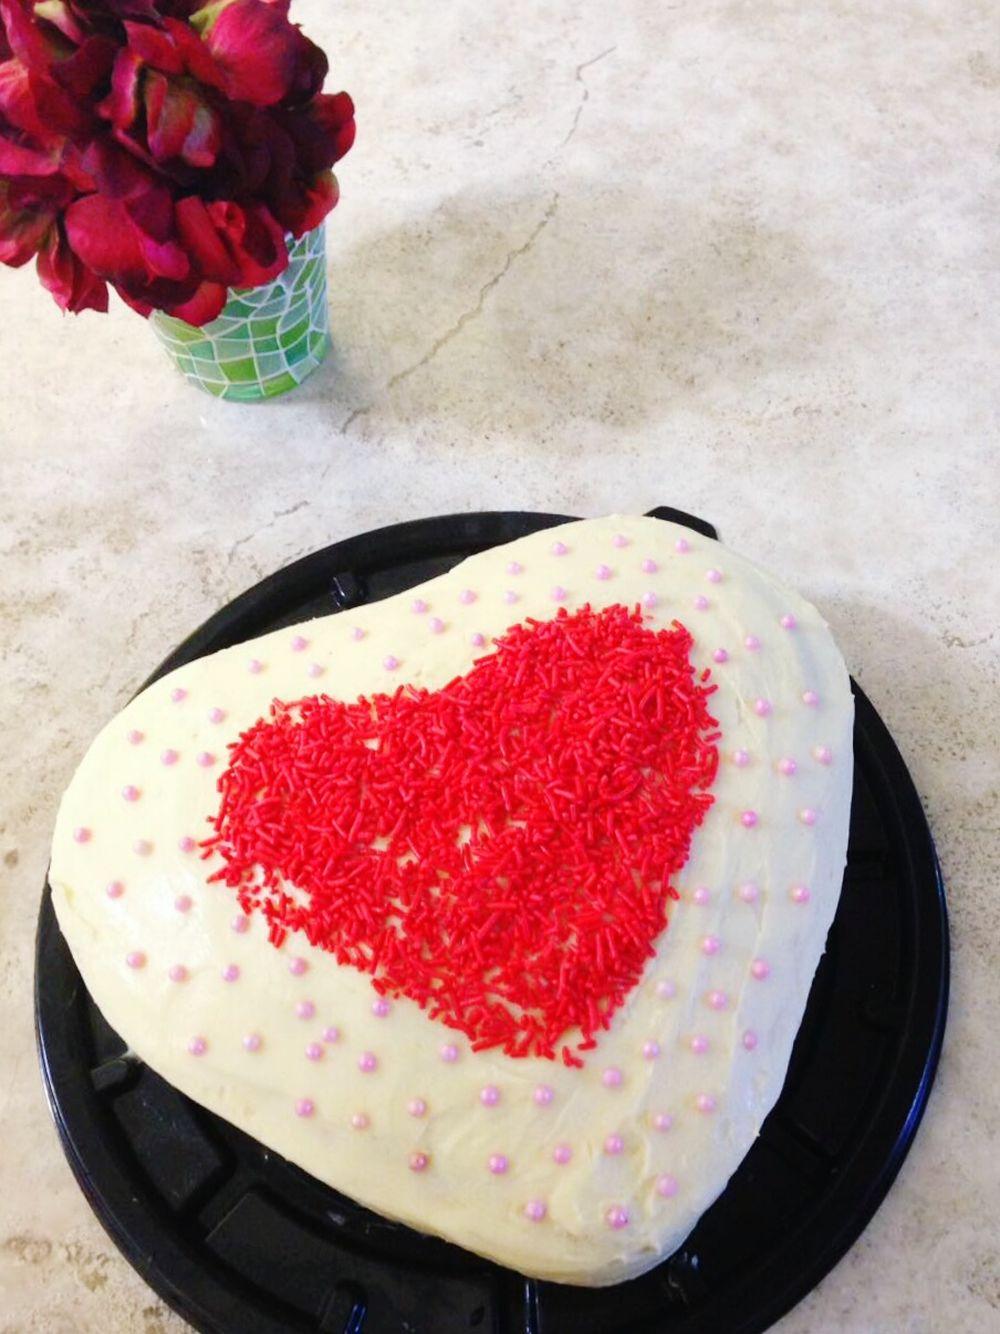 Cake♥ Heart ❤ Love ♥ Food Sweet Food Grastronomy Taking Photos Hello EyeEm Cupcake Colors Cocinando My Hobby Love♡ Estoesvida